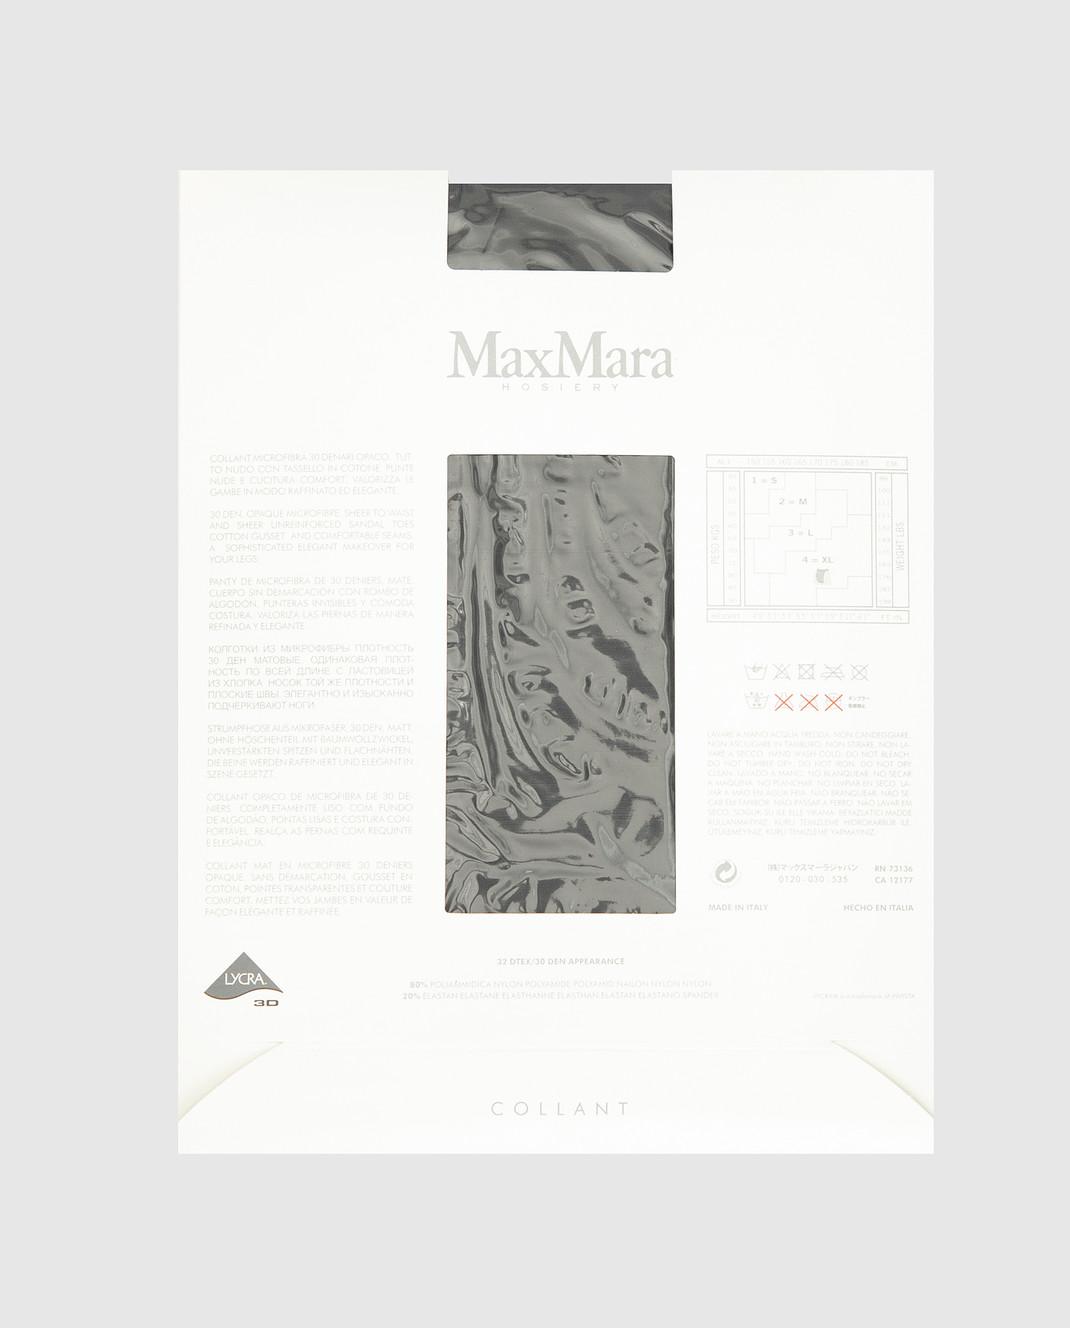 Max Mara Темно-серые колготы 30 ден изображение 4